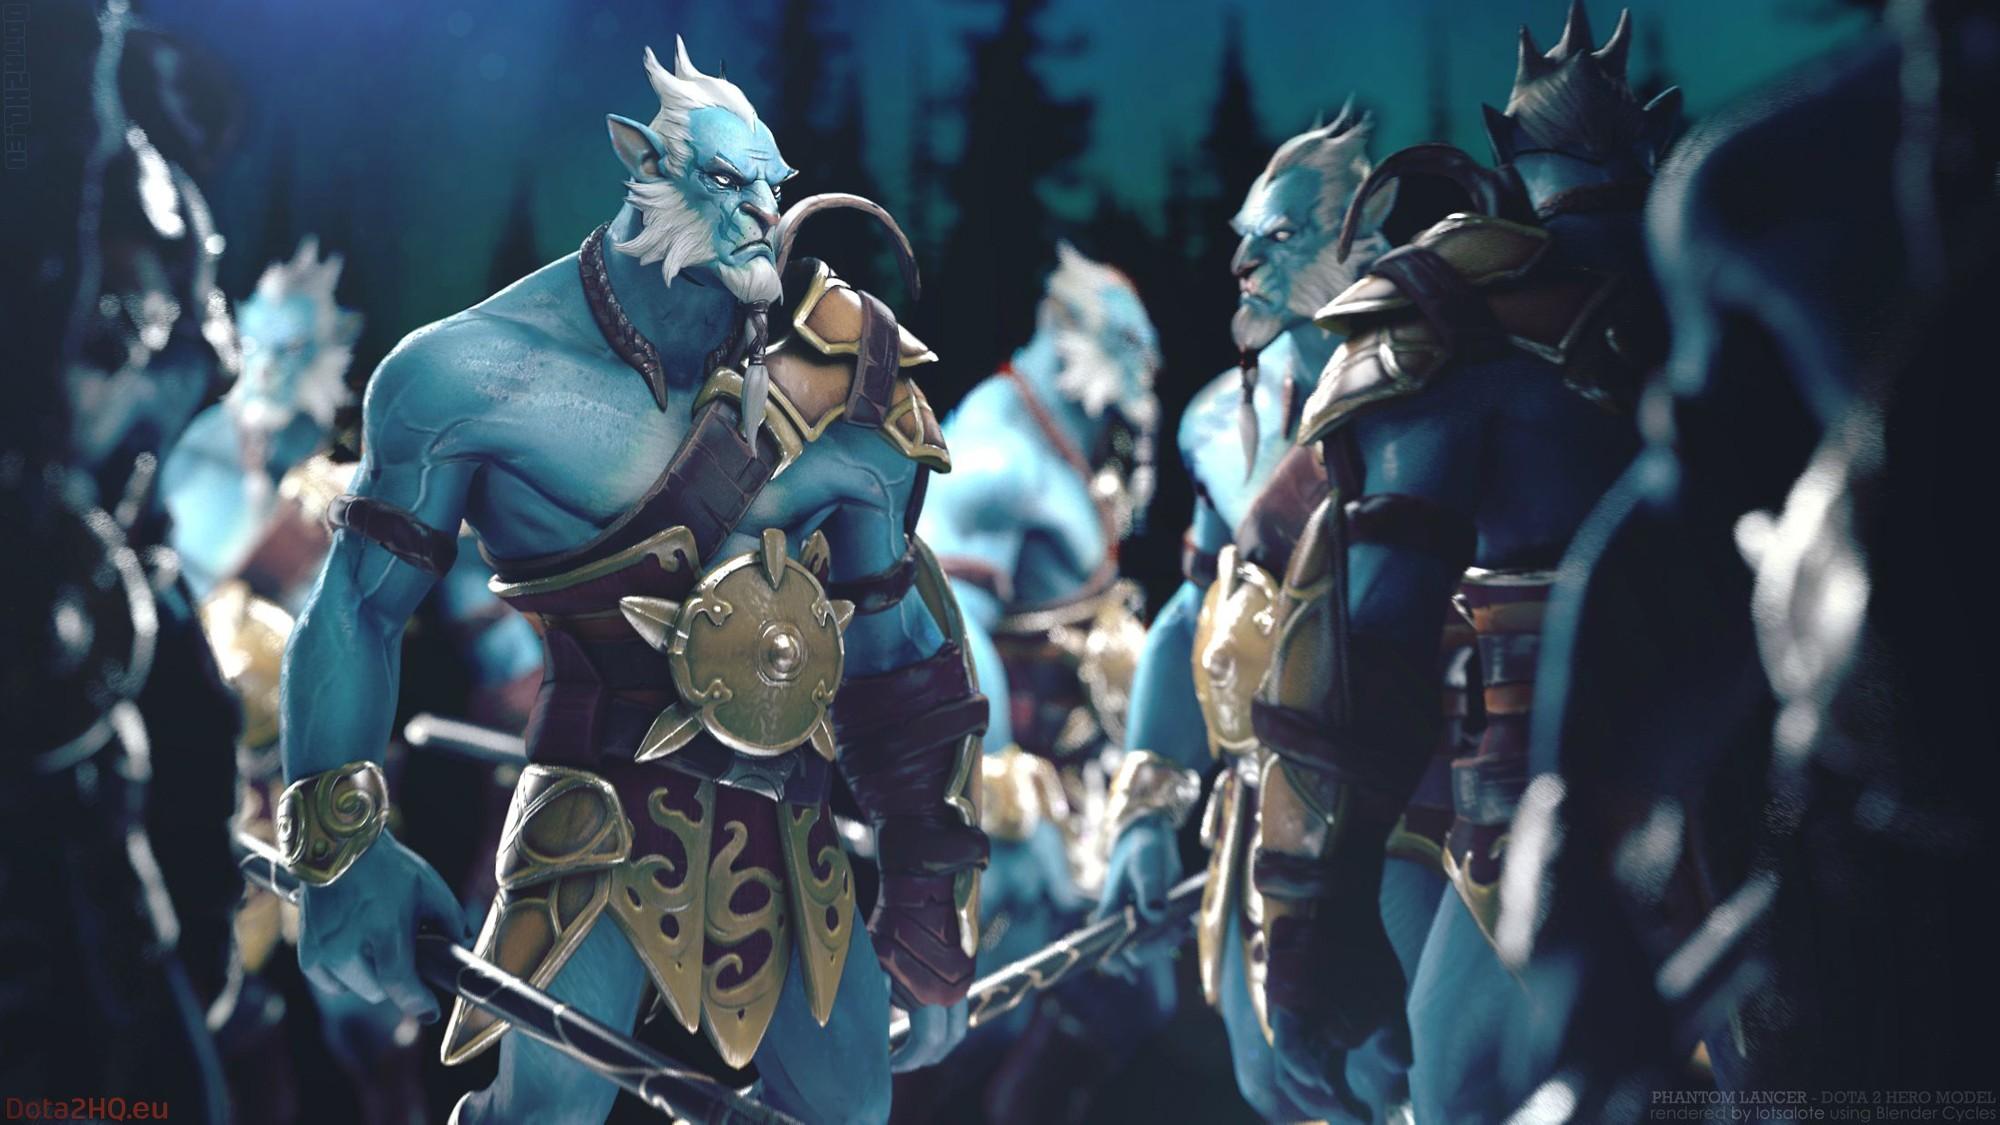 General 2000x1125 Dota 2 Dota Defense of the ancient Valve Valve Corporation Phantom Lancer blue